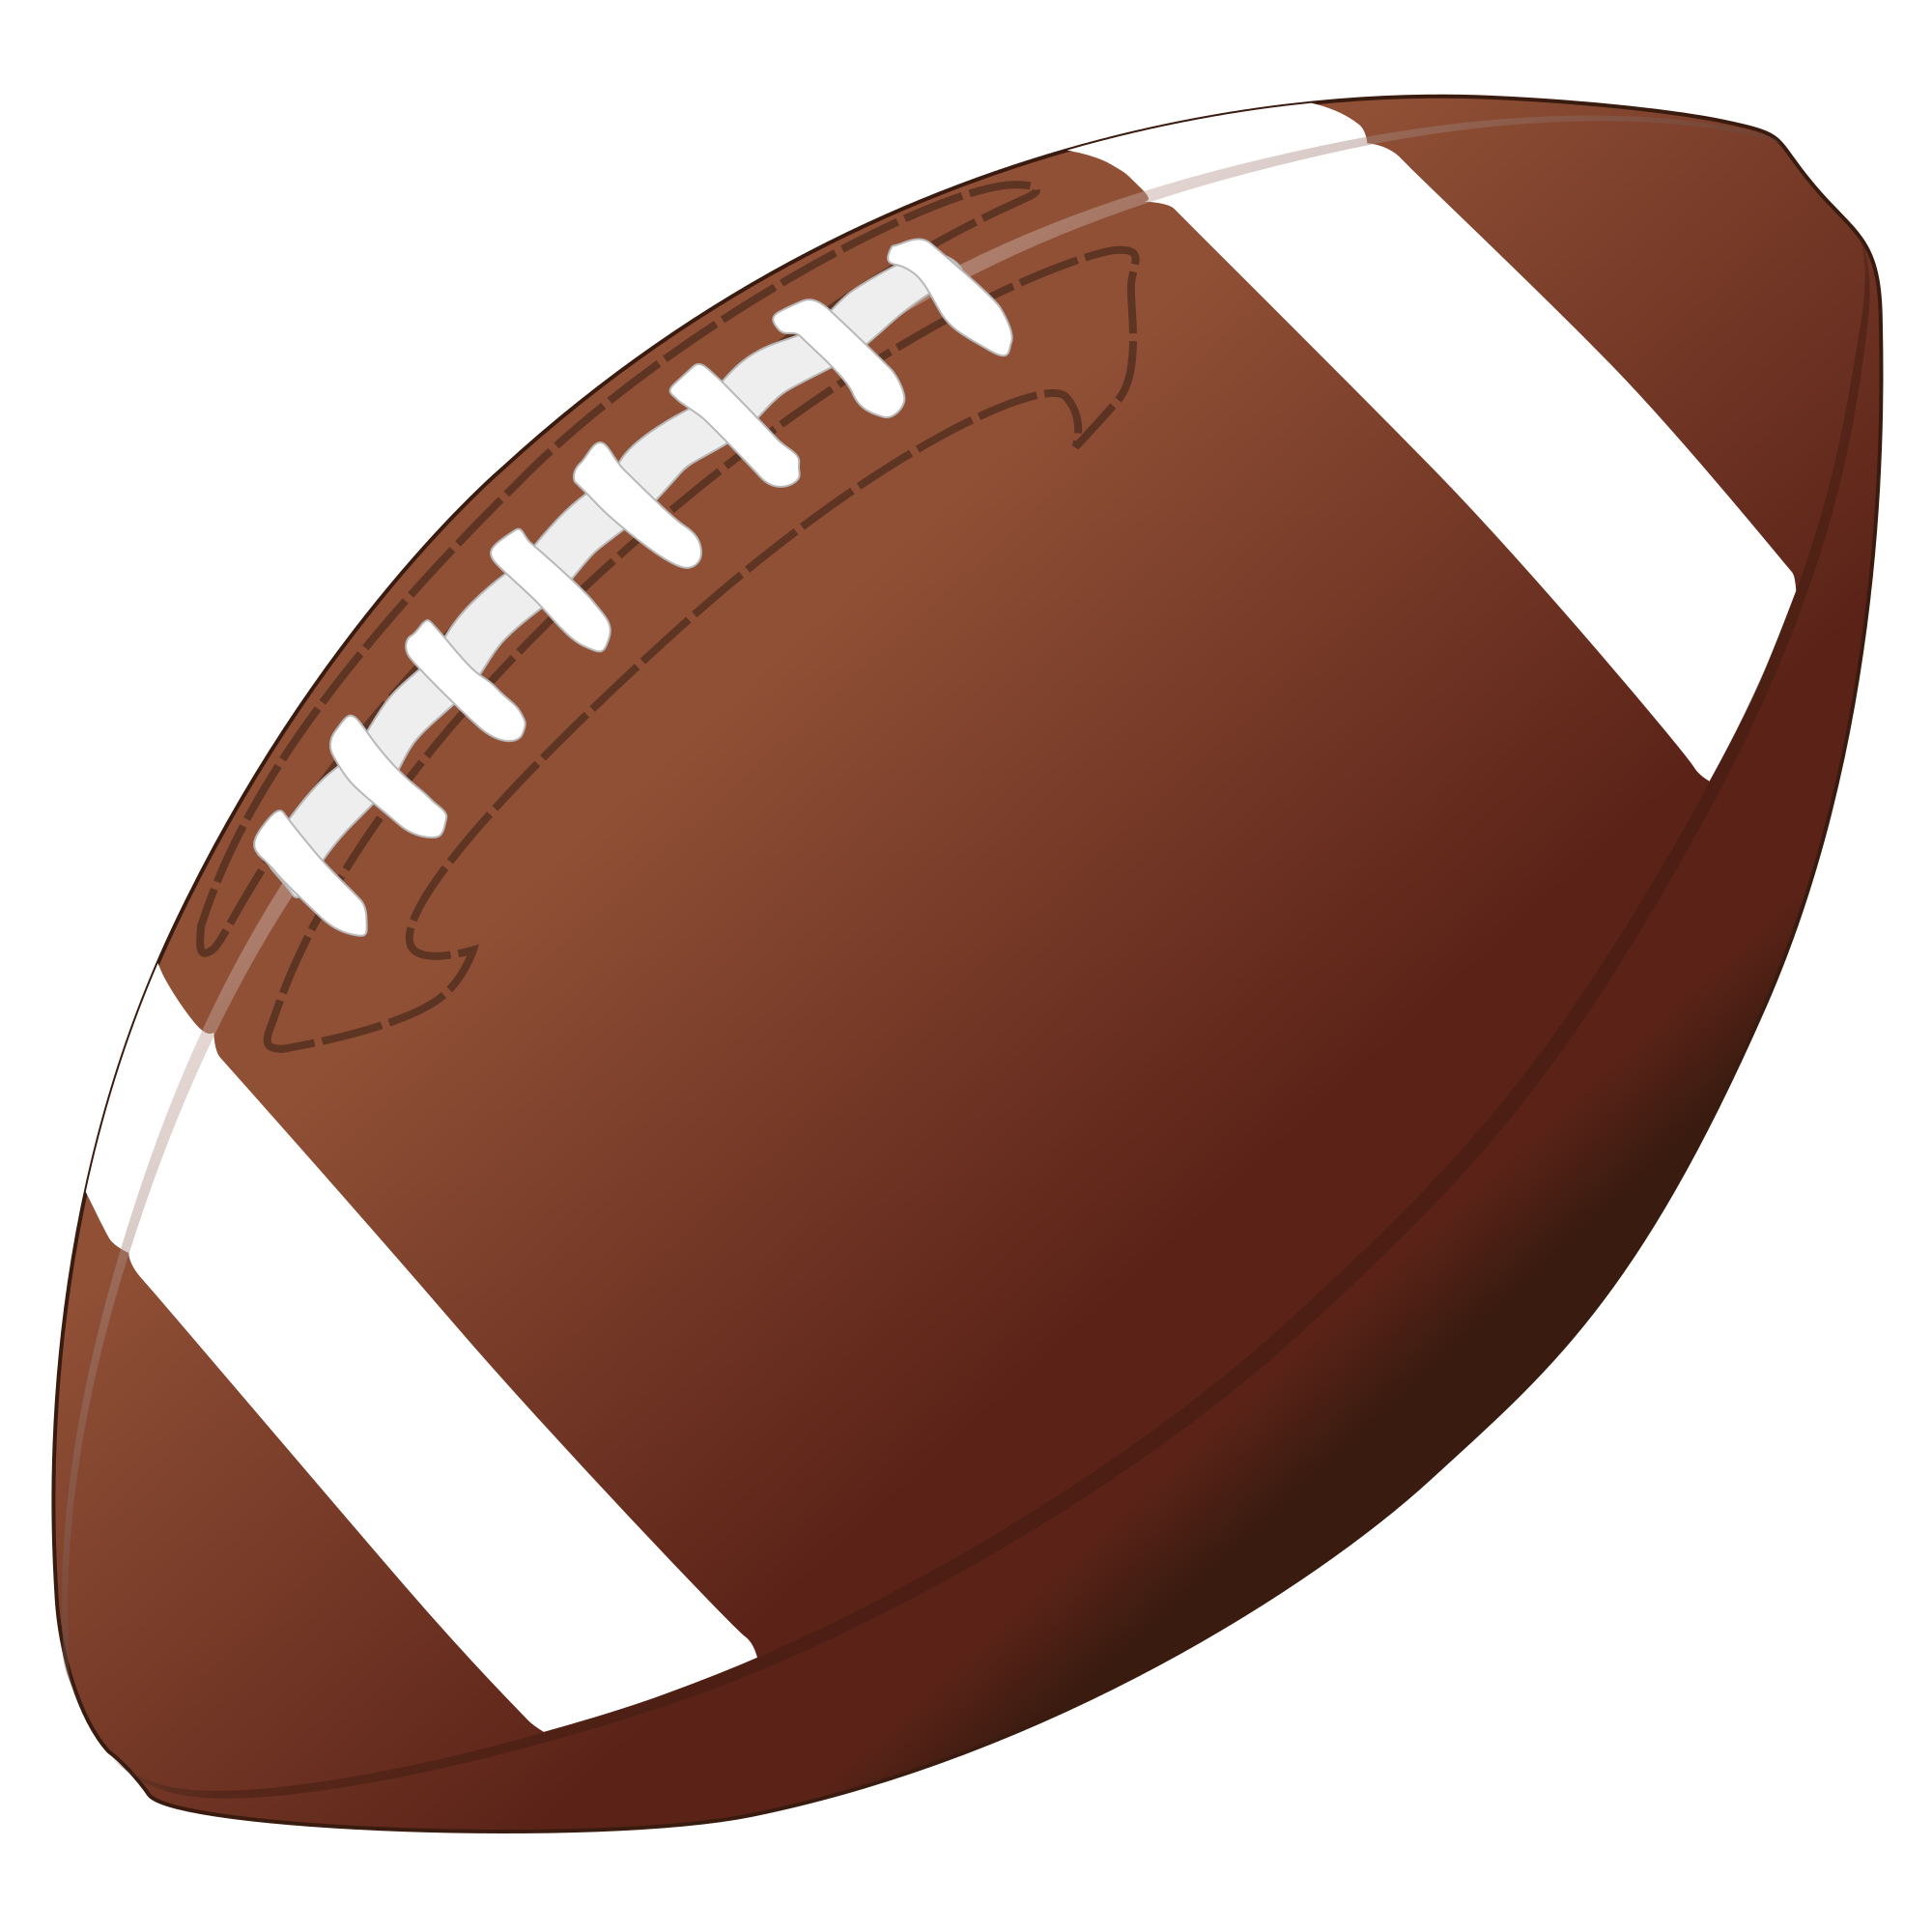 American Football PNG Image.